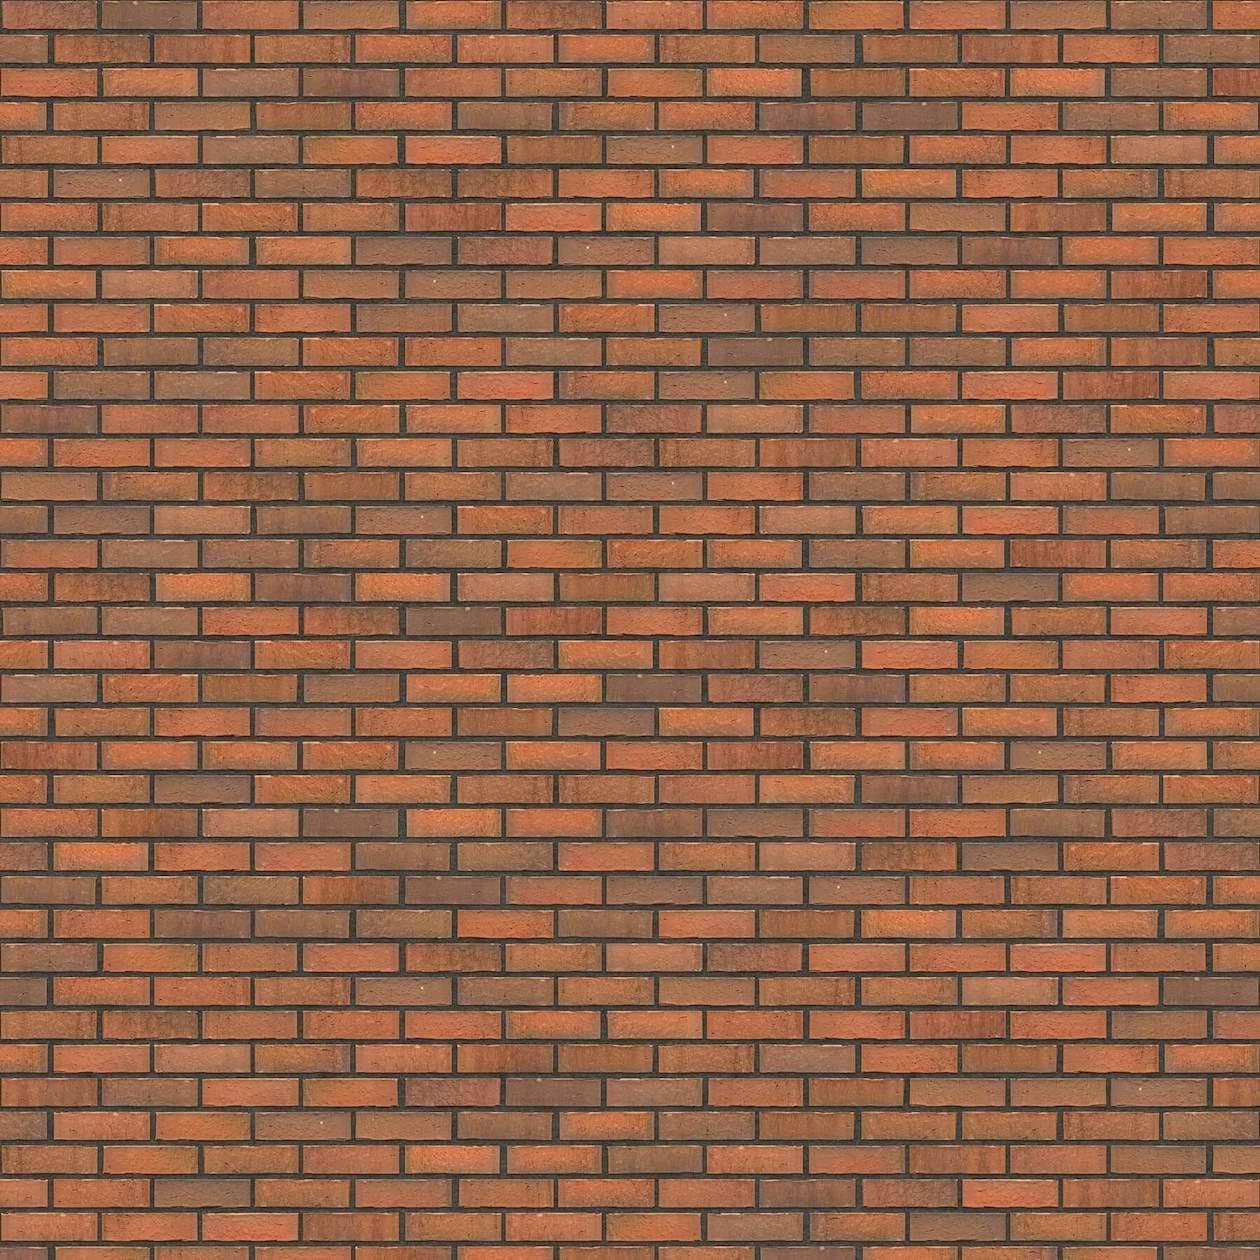 Puna-cigla-FeldHaus-Klinker-brick-house-beograd-nf-k-767-Antracit Fuga